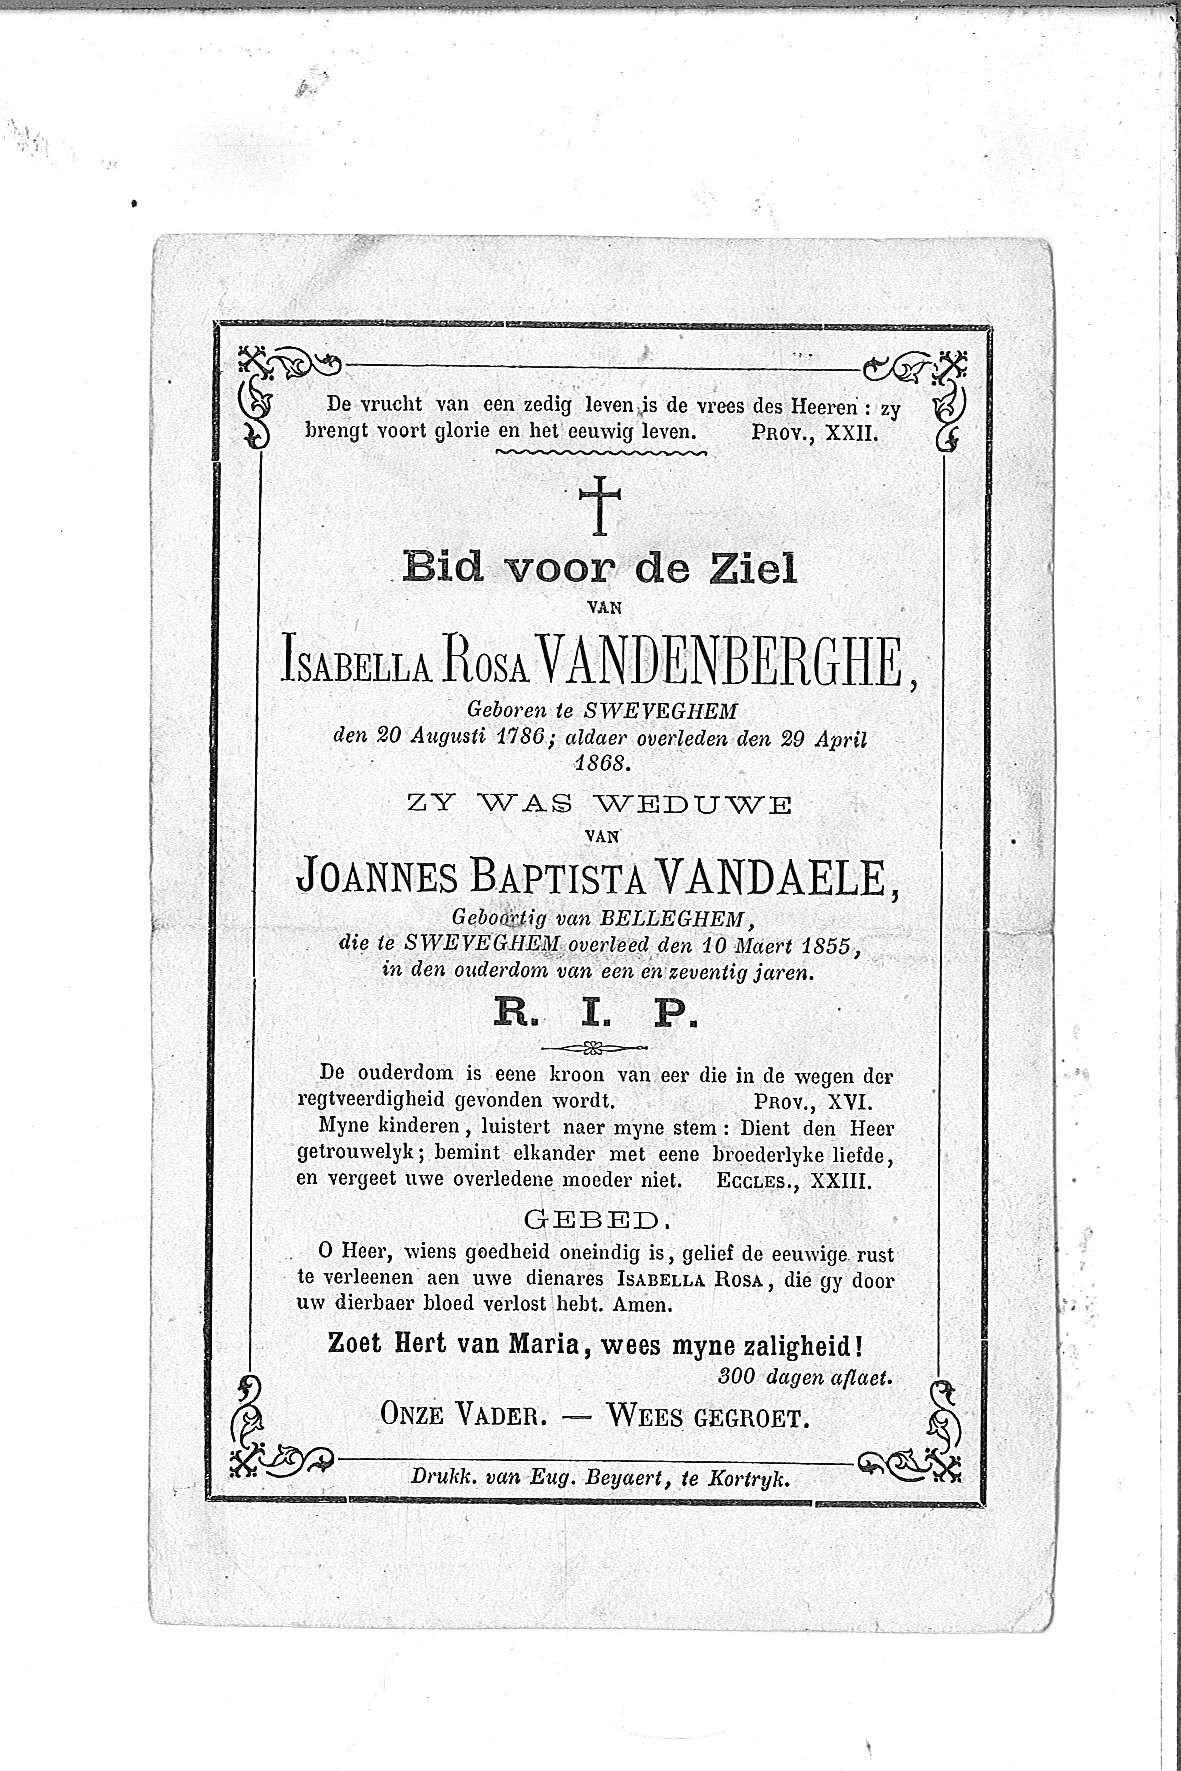 Joannes-Baptista(1855)20140729142639_00001.jpg